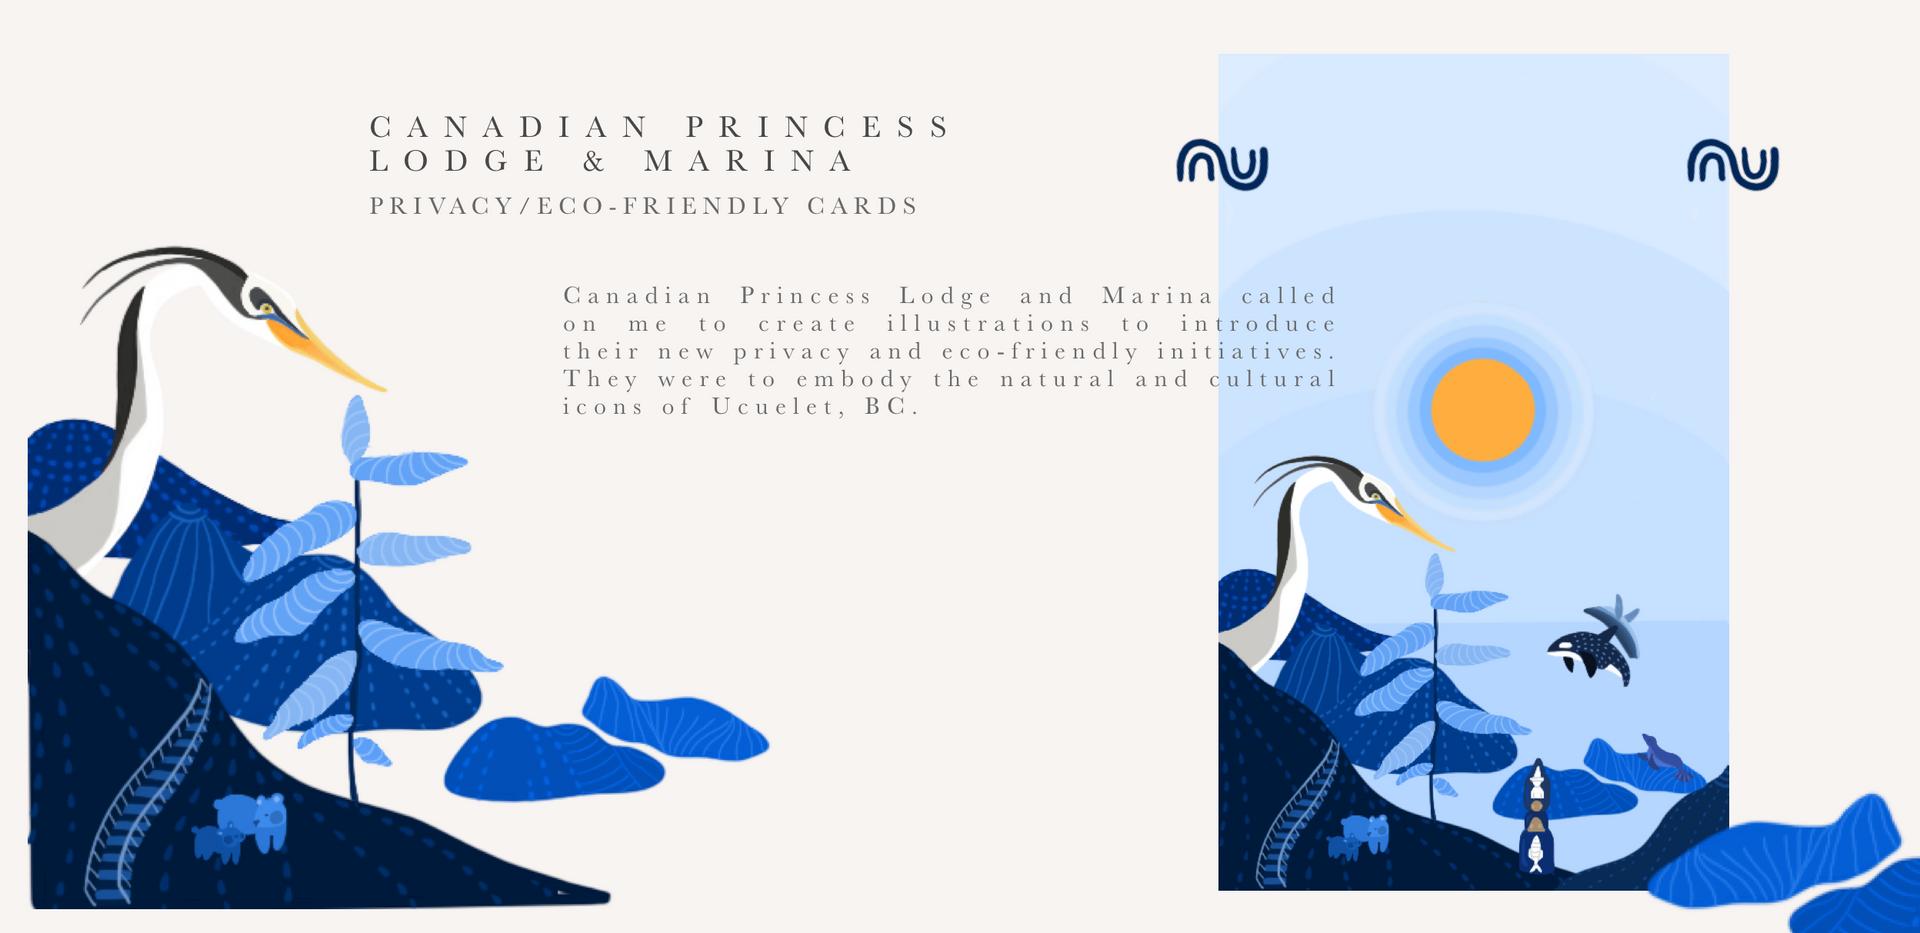 CANADIAN PRINCESS LODGE & MARINA